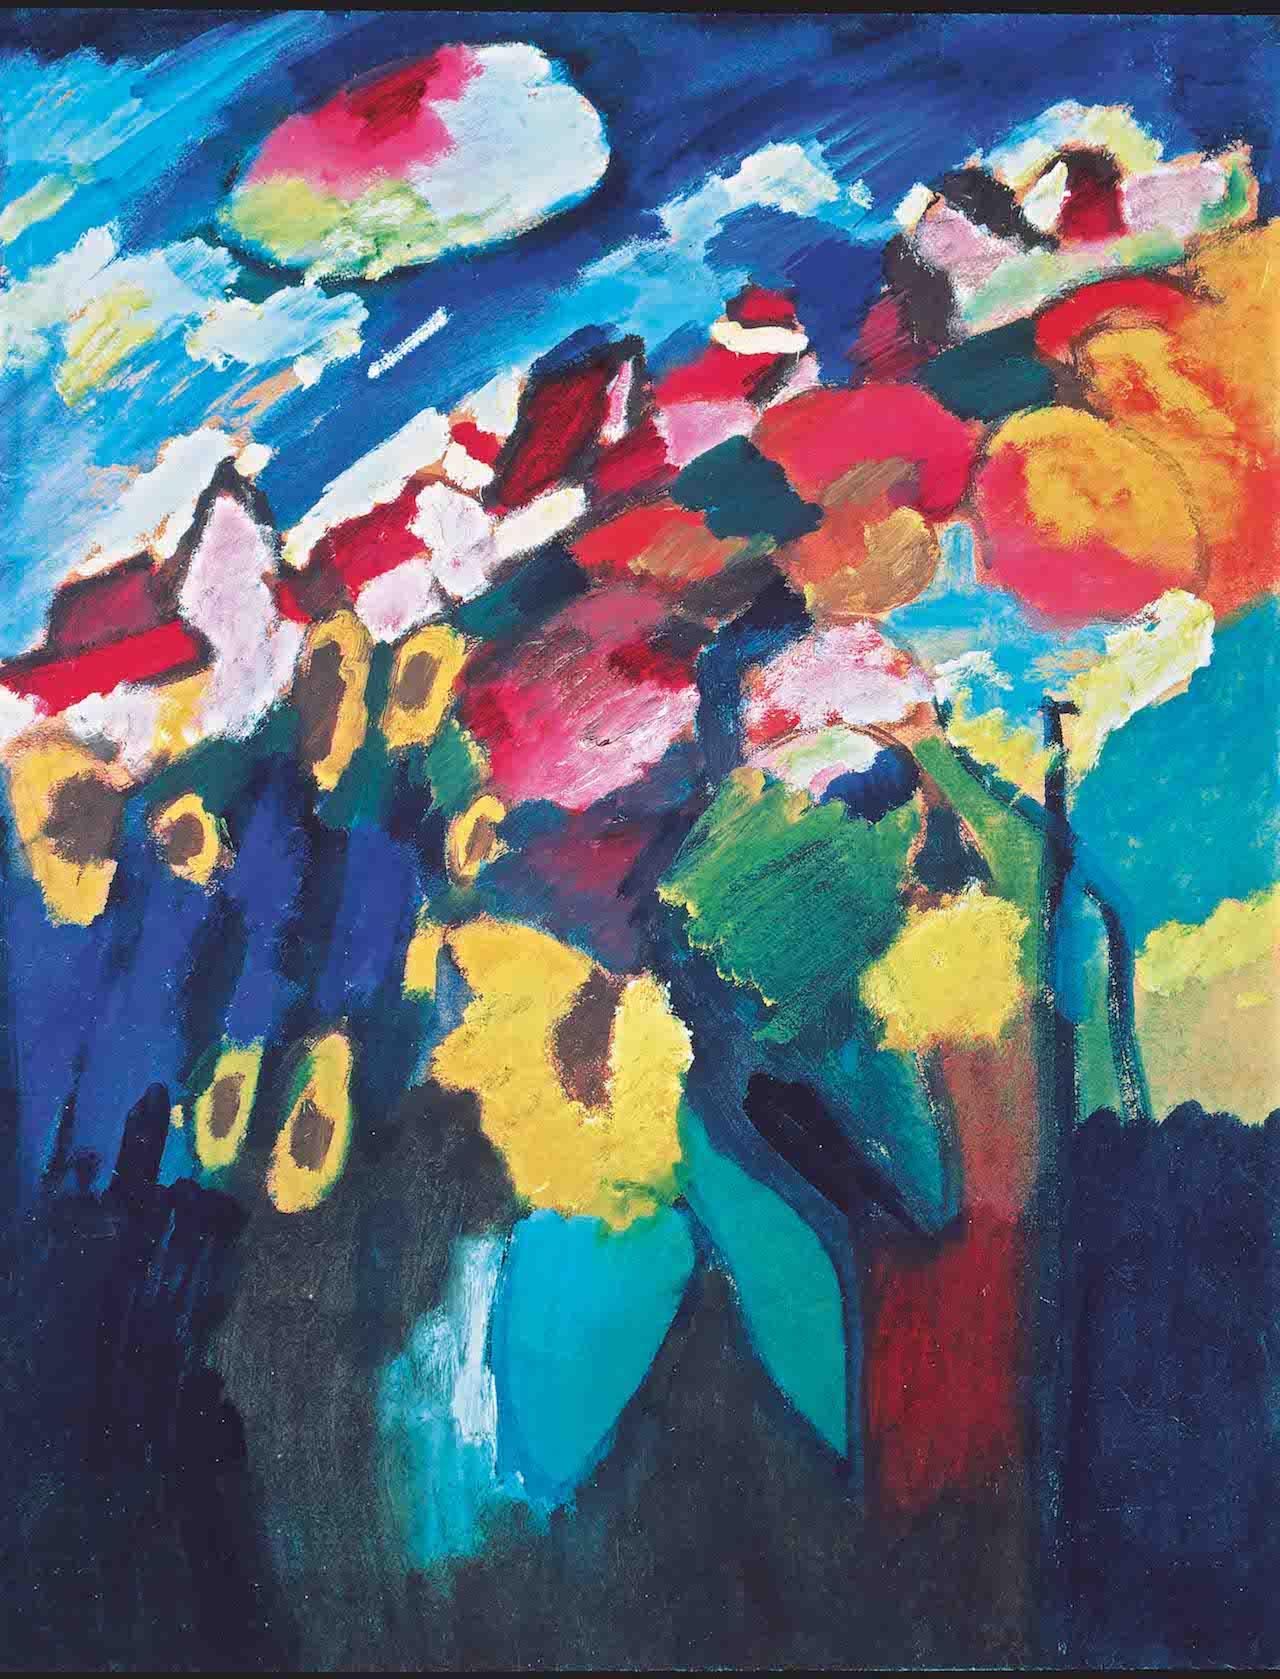 Wassily Kandinsky, Murnau The Garden II, 1910 Oil on cardboard, 67 x 51 cm Merzbacher Kunststiftung Photo (c) Merzbacher Kunststiftung